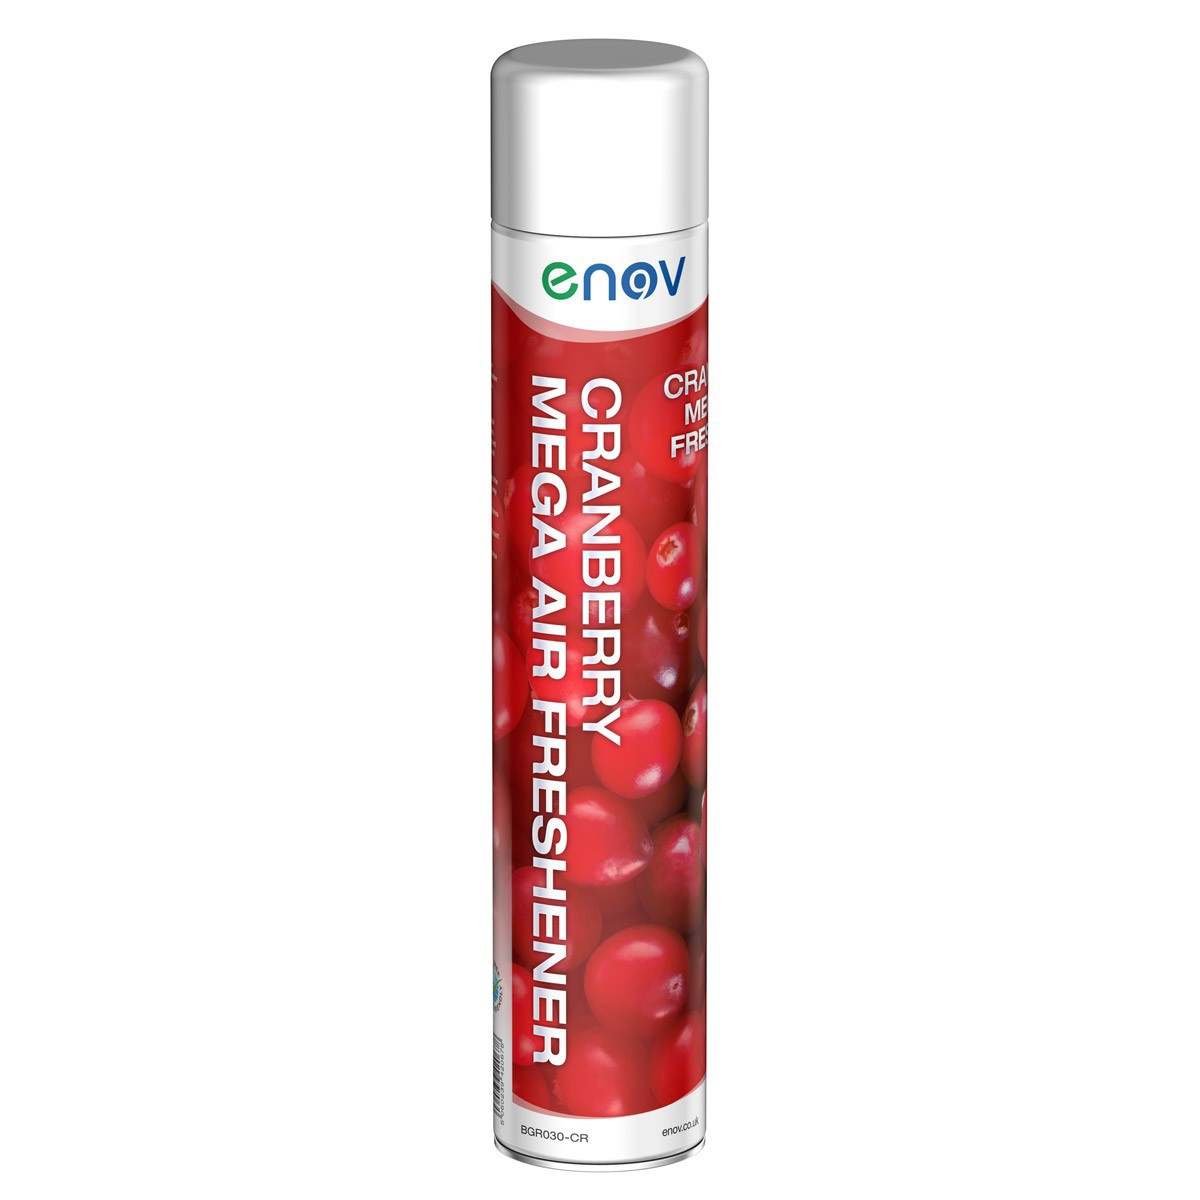 Enov Cranberry Mega Air Freshener